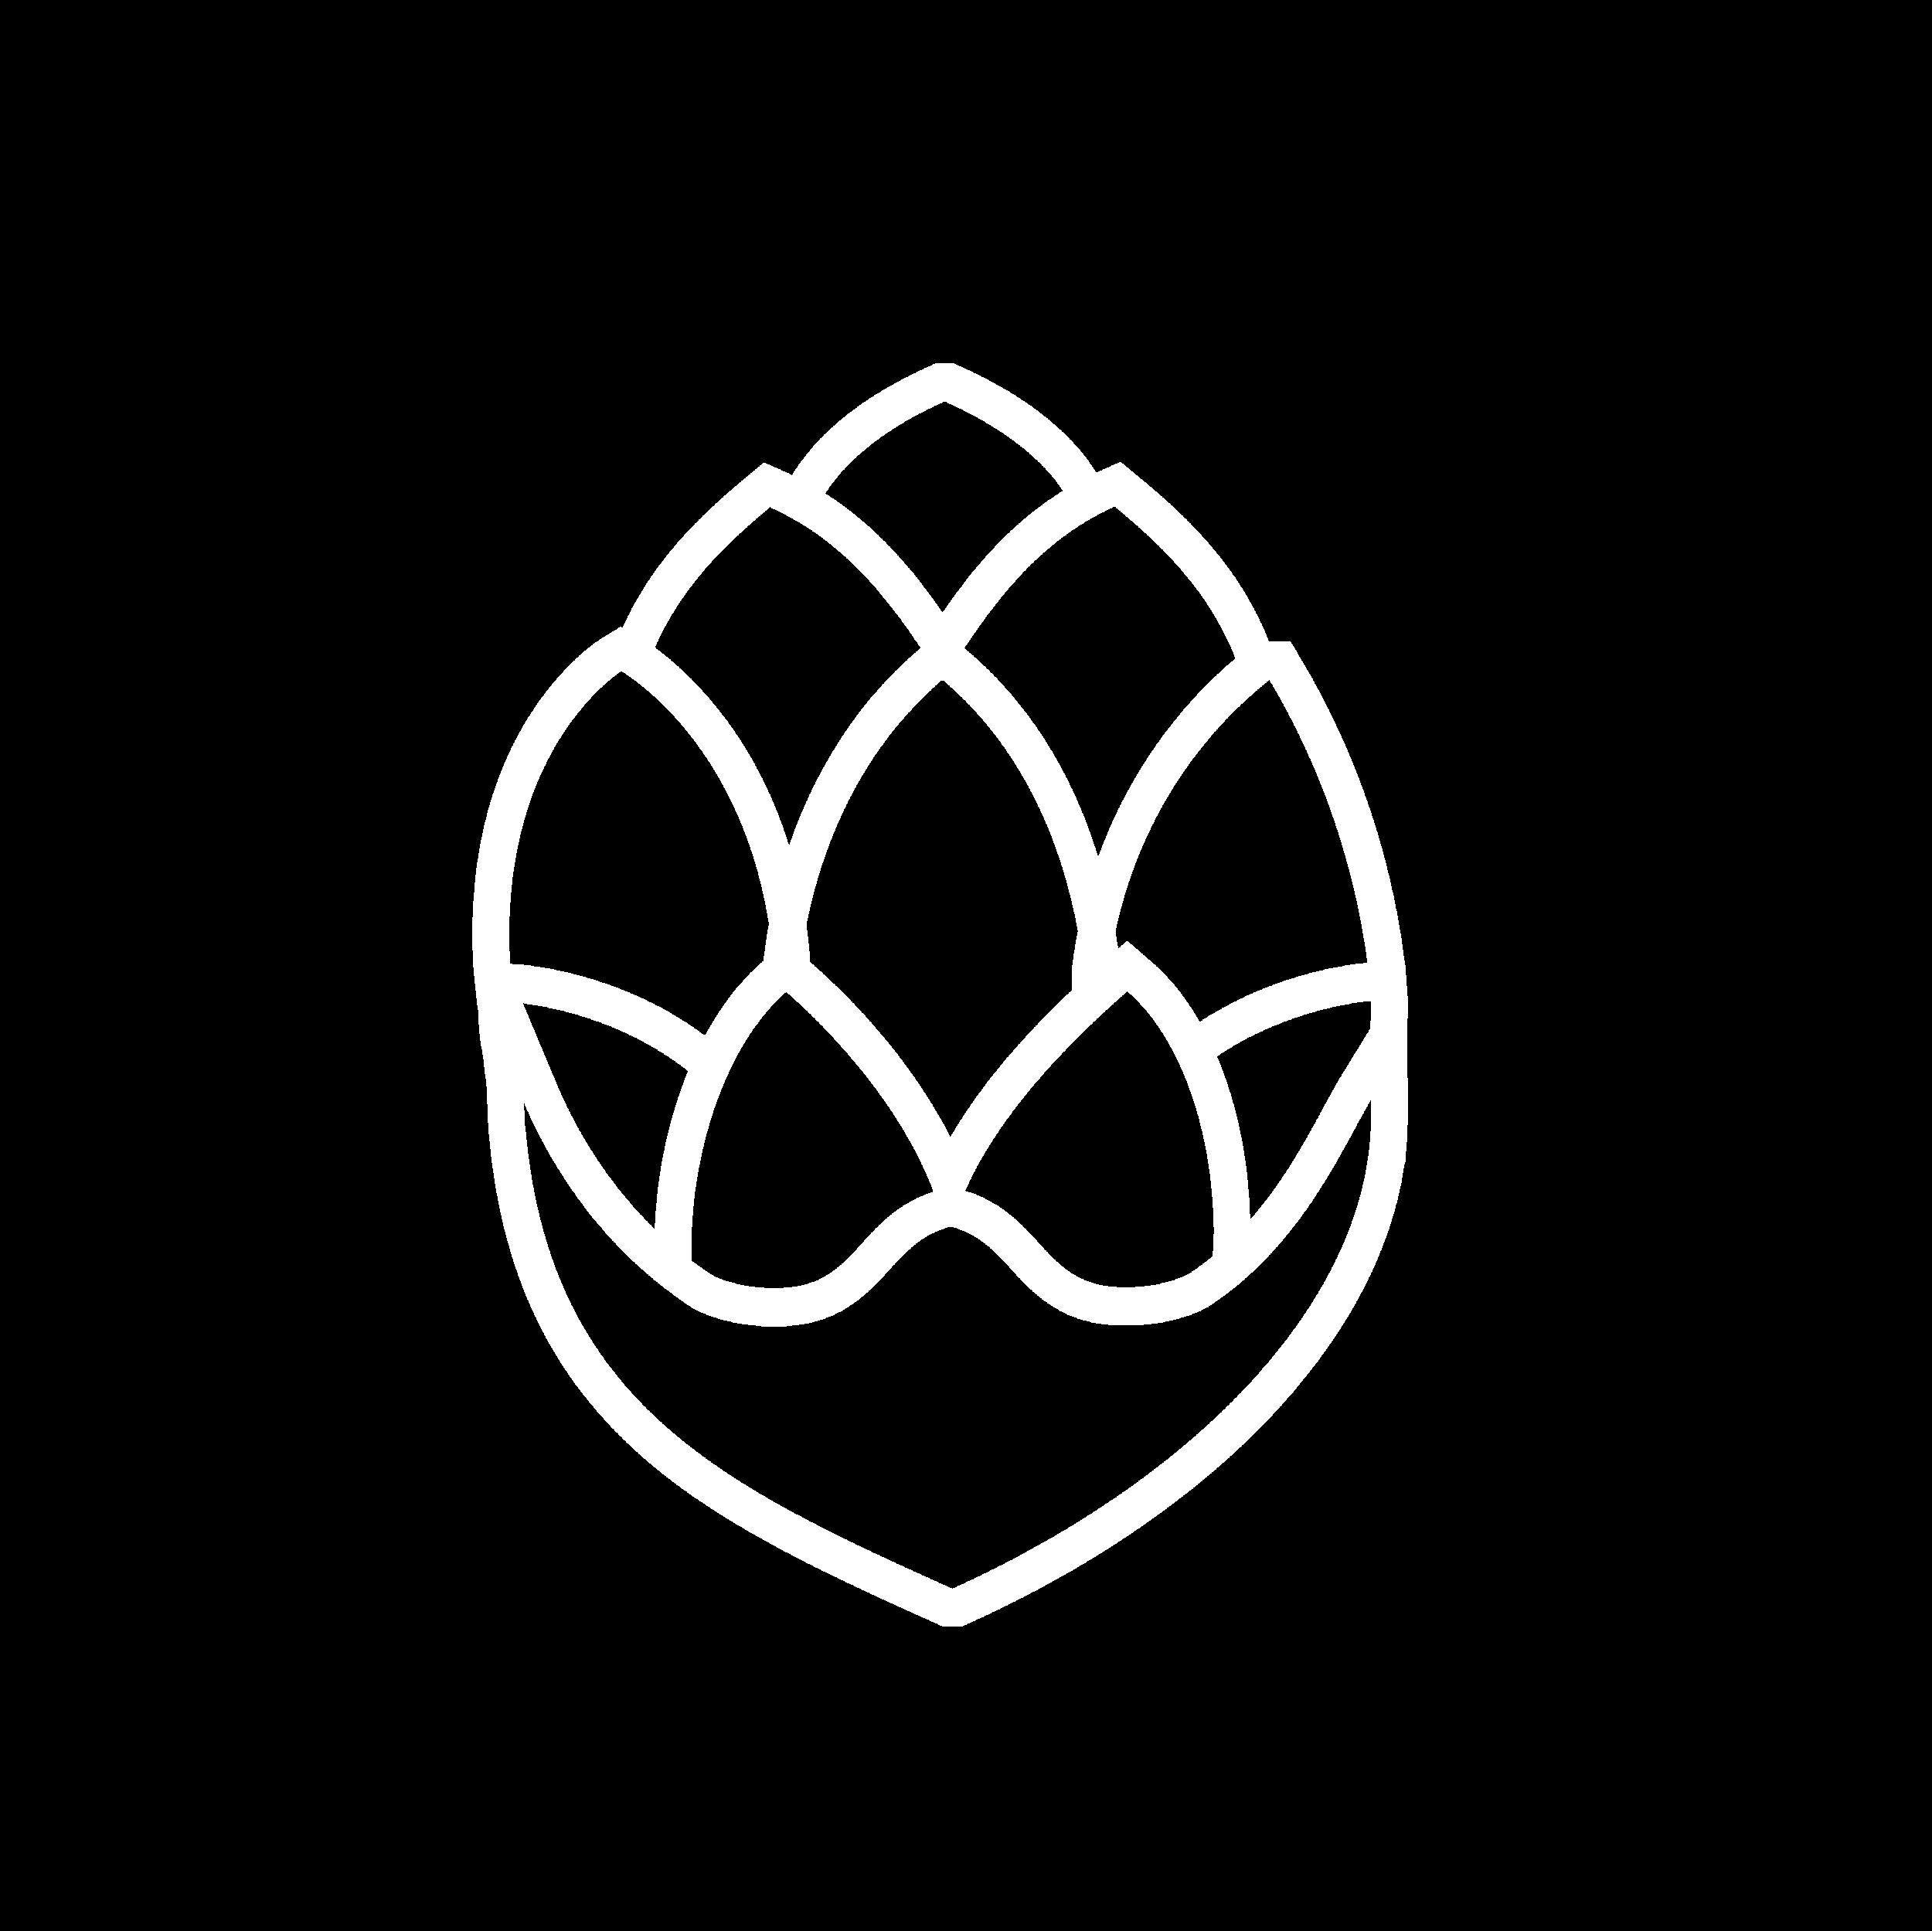 Nirvana - Brand Elements 130619-01.png